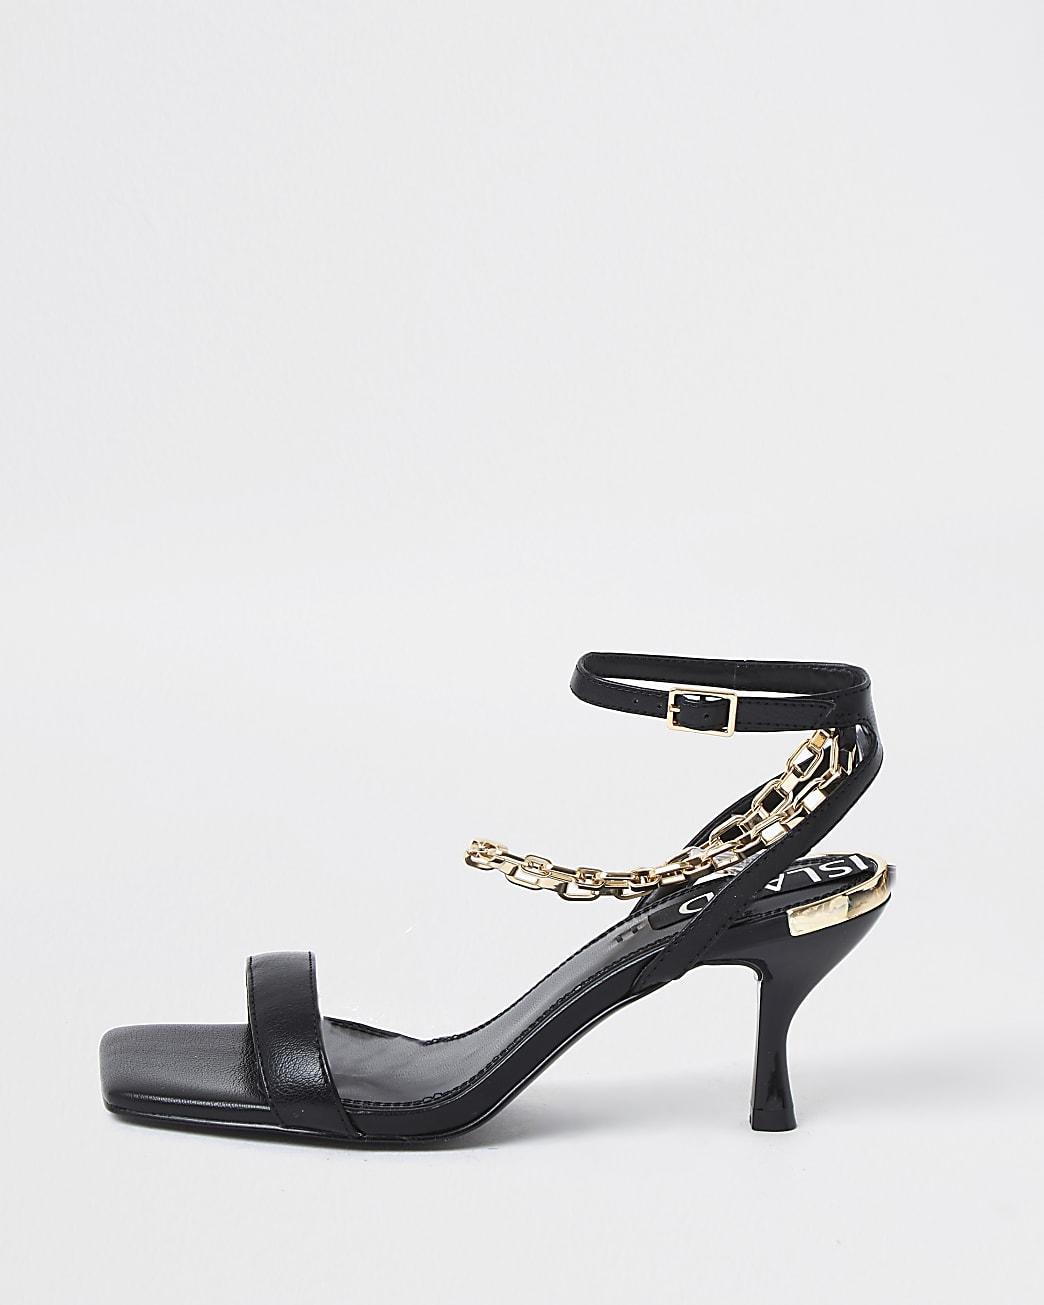 Black square toe ankle chain kitten heels